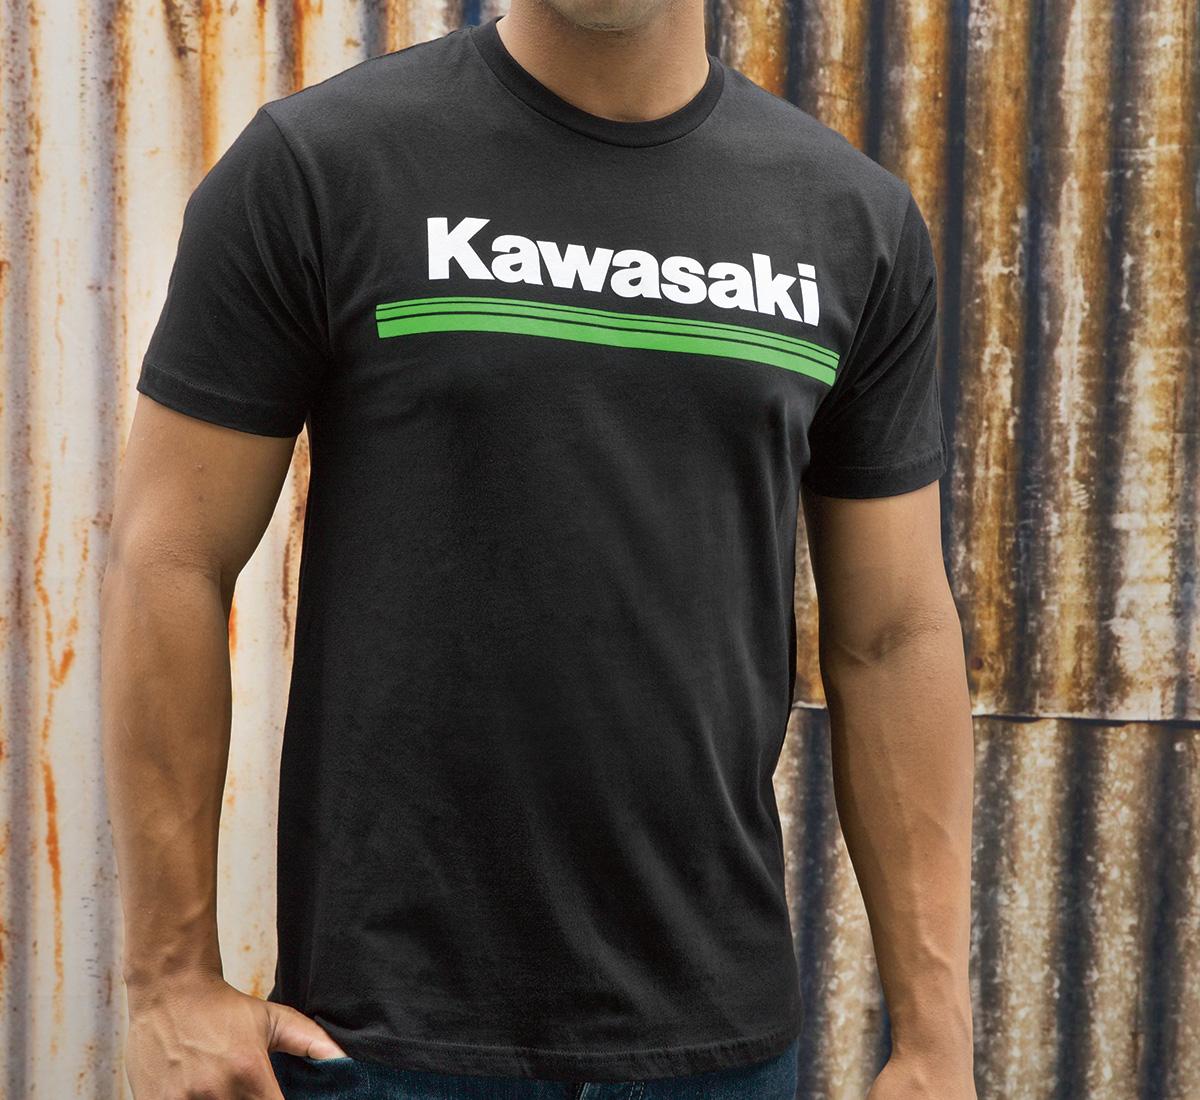 kawasaki 3 green lines t shirt. Black Bedroom Furniture Sets. Home Design Ideas